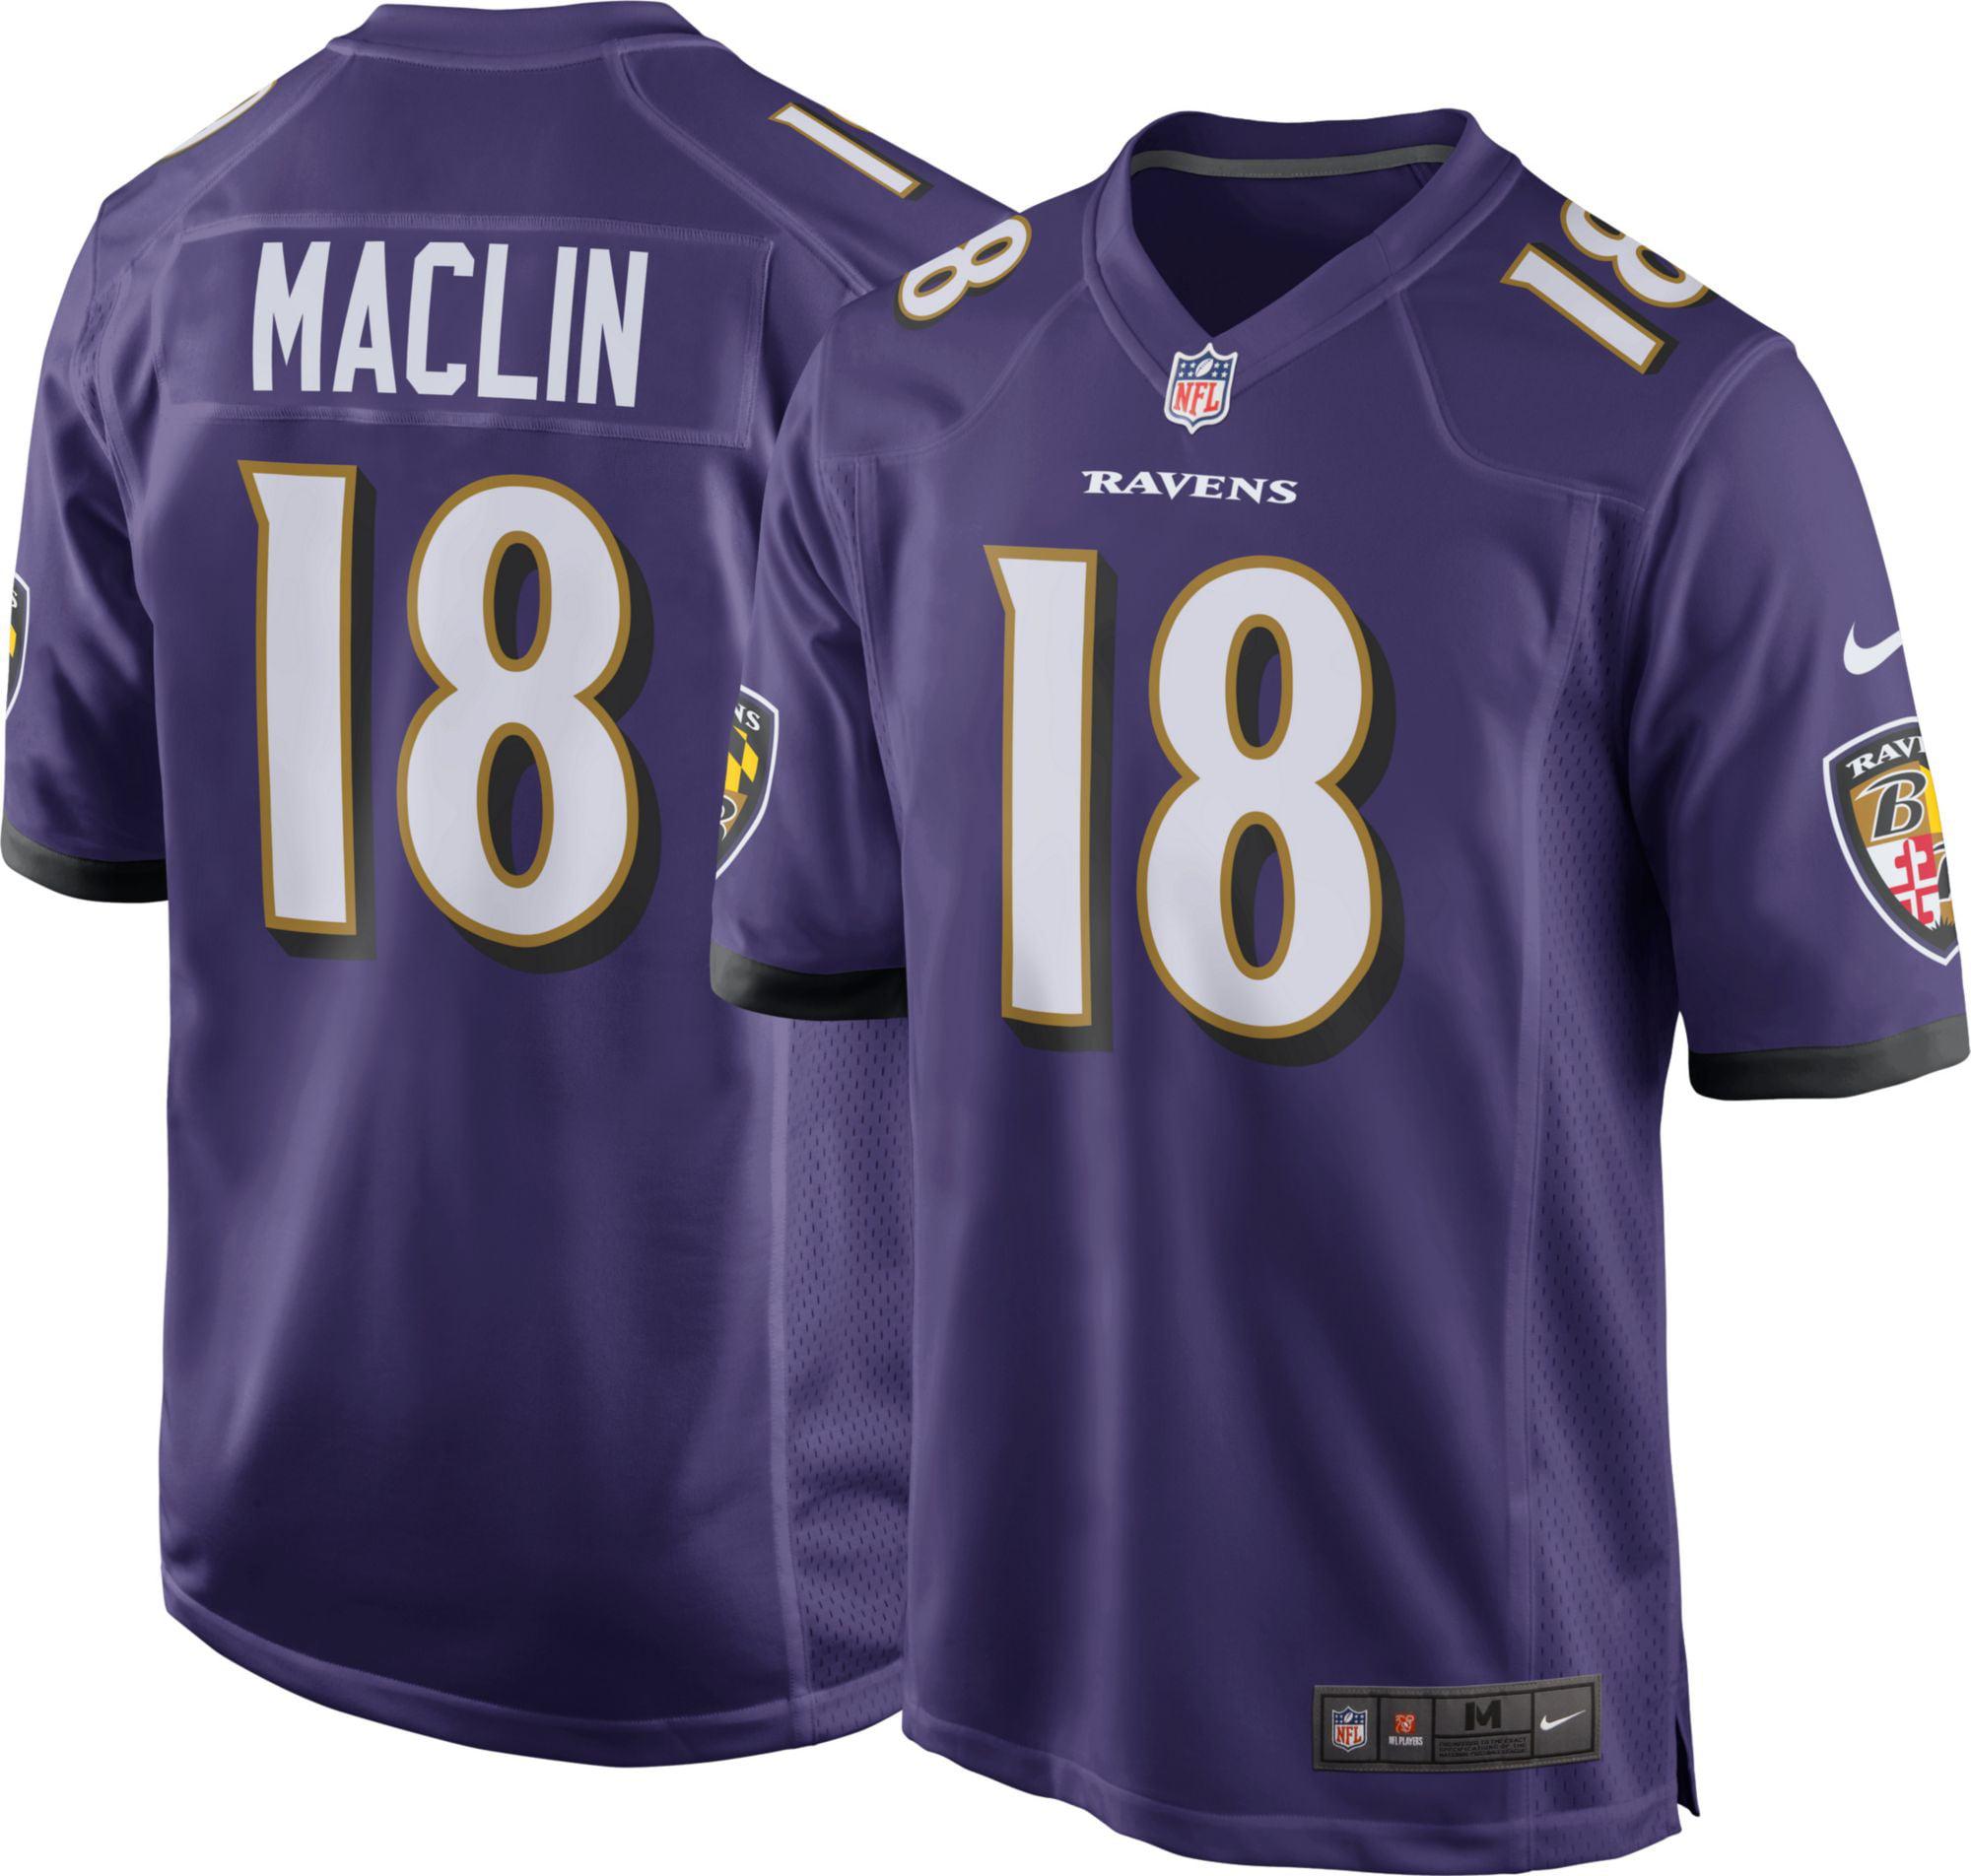 Nike Men s Home Game Jersey Baltimore Ravens Jeremy Maclin  18 - Walmart.com 8b6ce4787